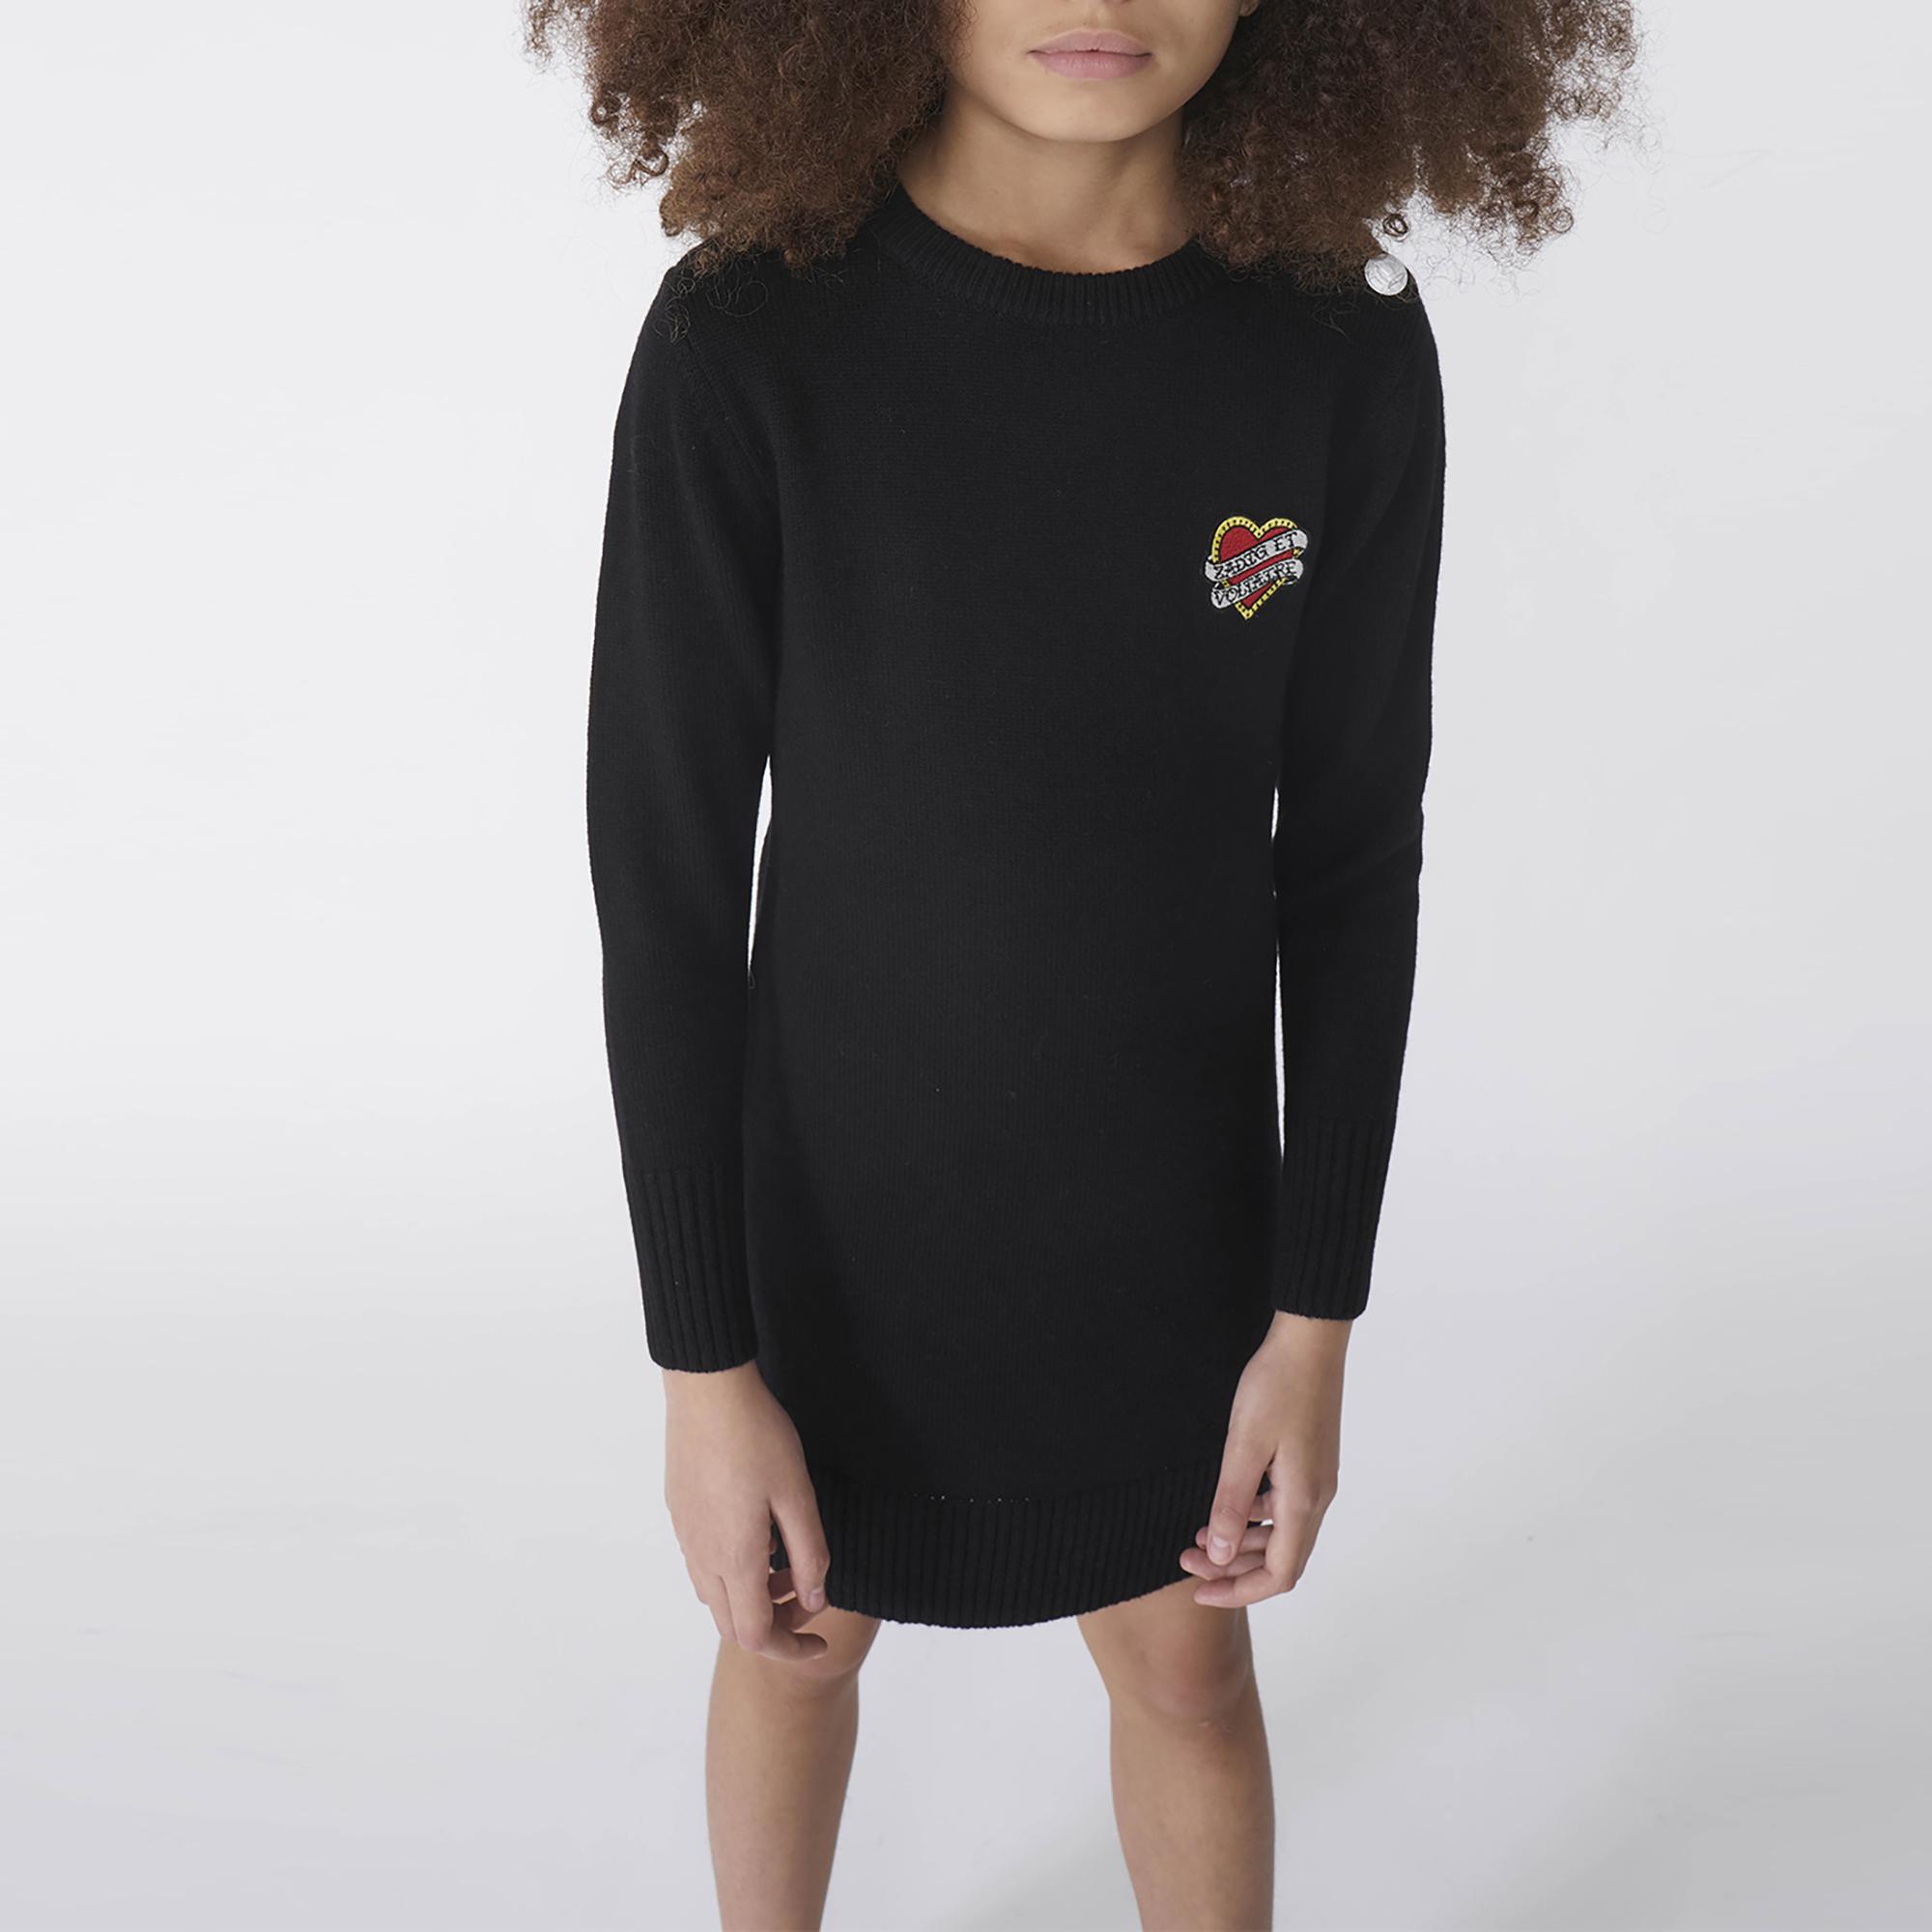 LONG SLEEVED DRESS ZADIG & VOLTAIRE for GIRL